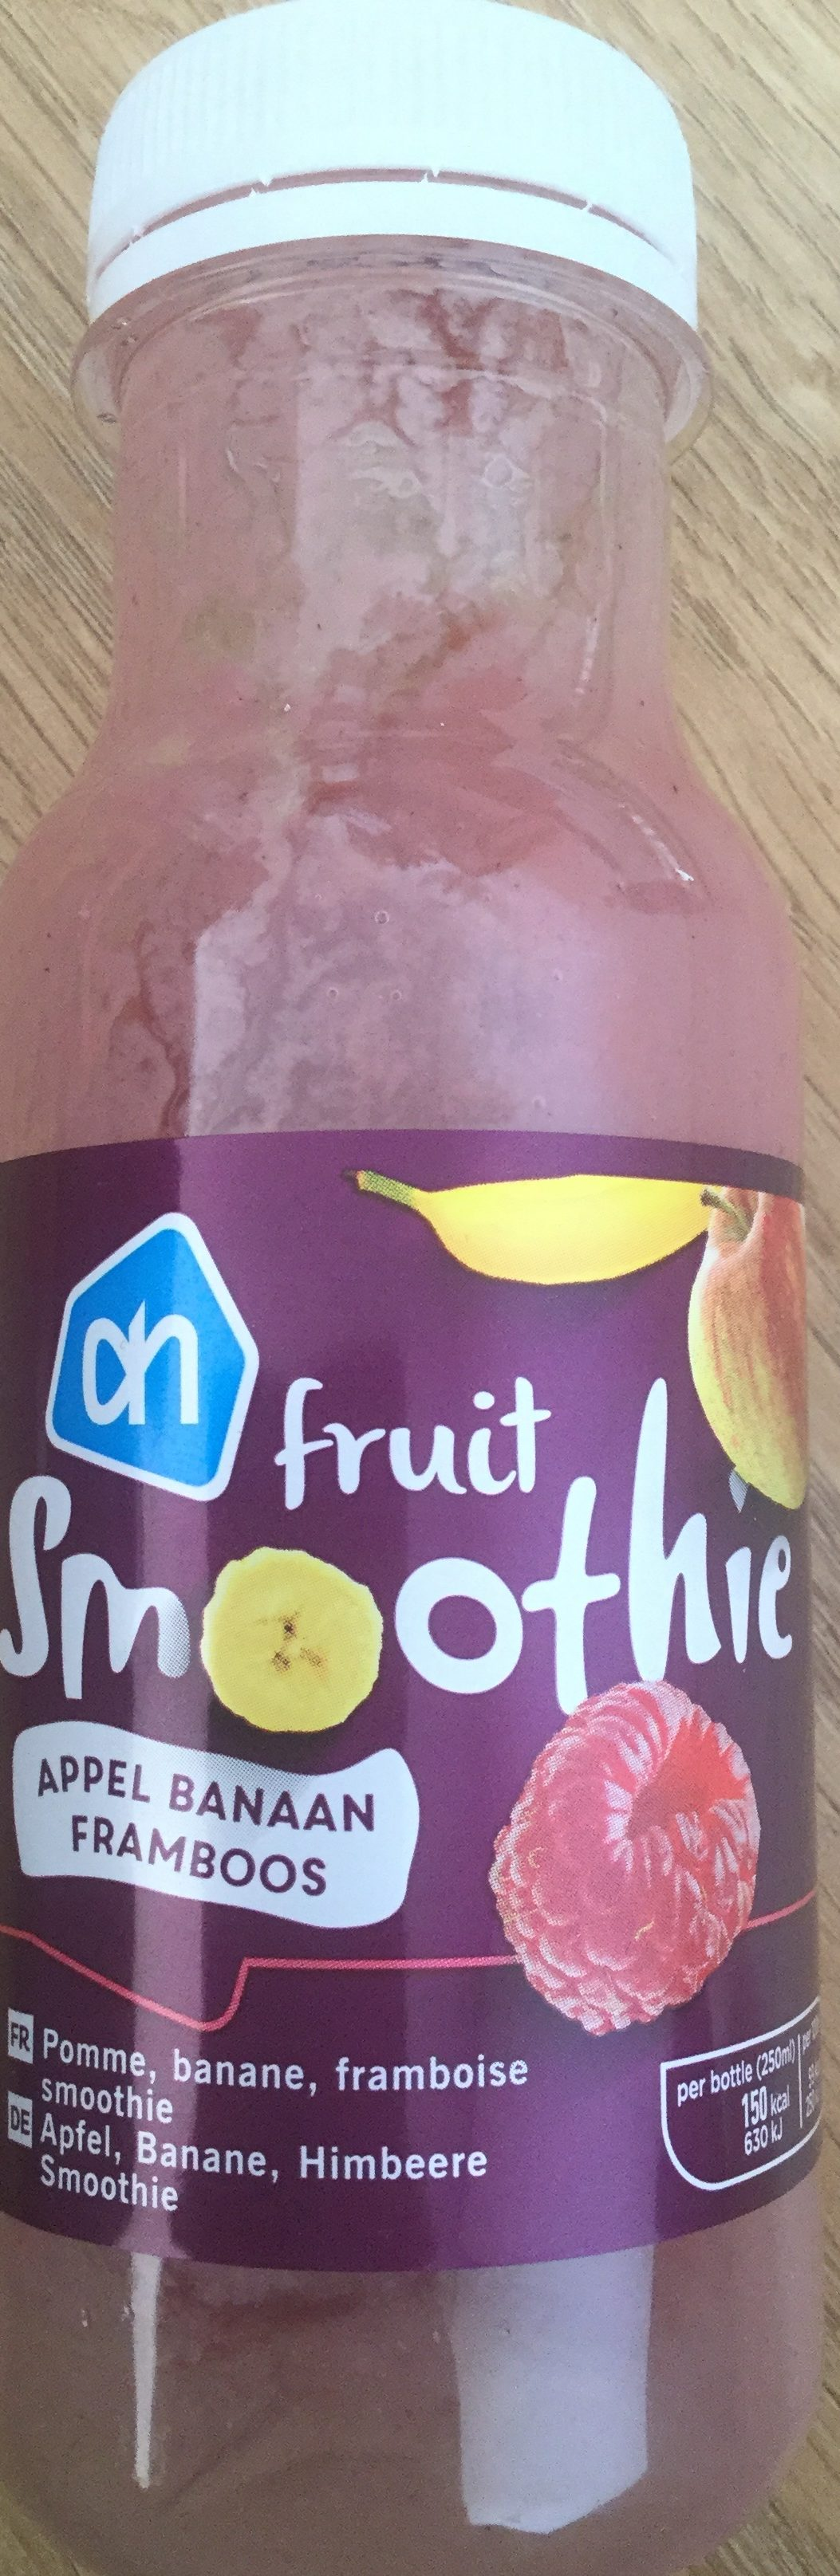 Fruit Smoothie appel banaan framboos - Produkt